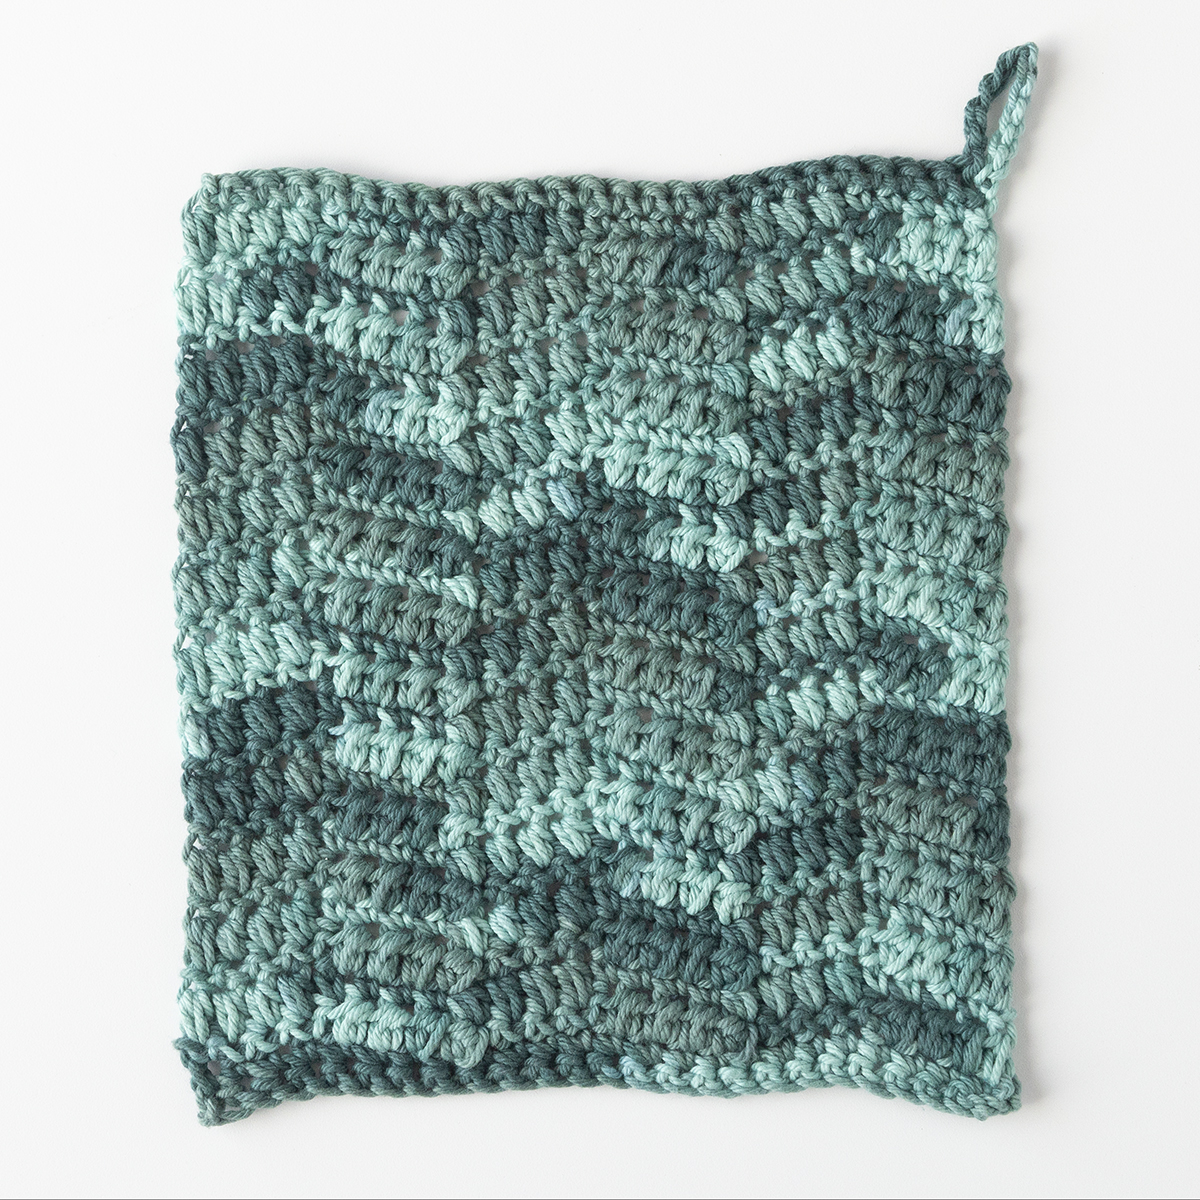 Crochet Chevron Dishcloth Knitting Patterns And Crochet Patterns